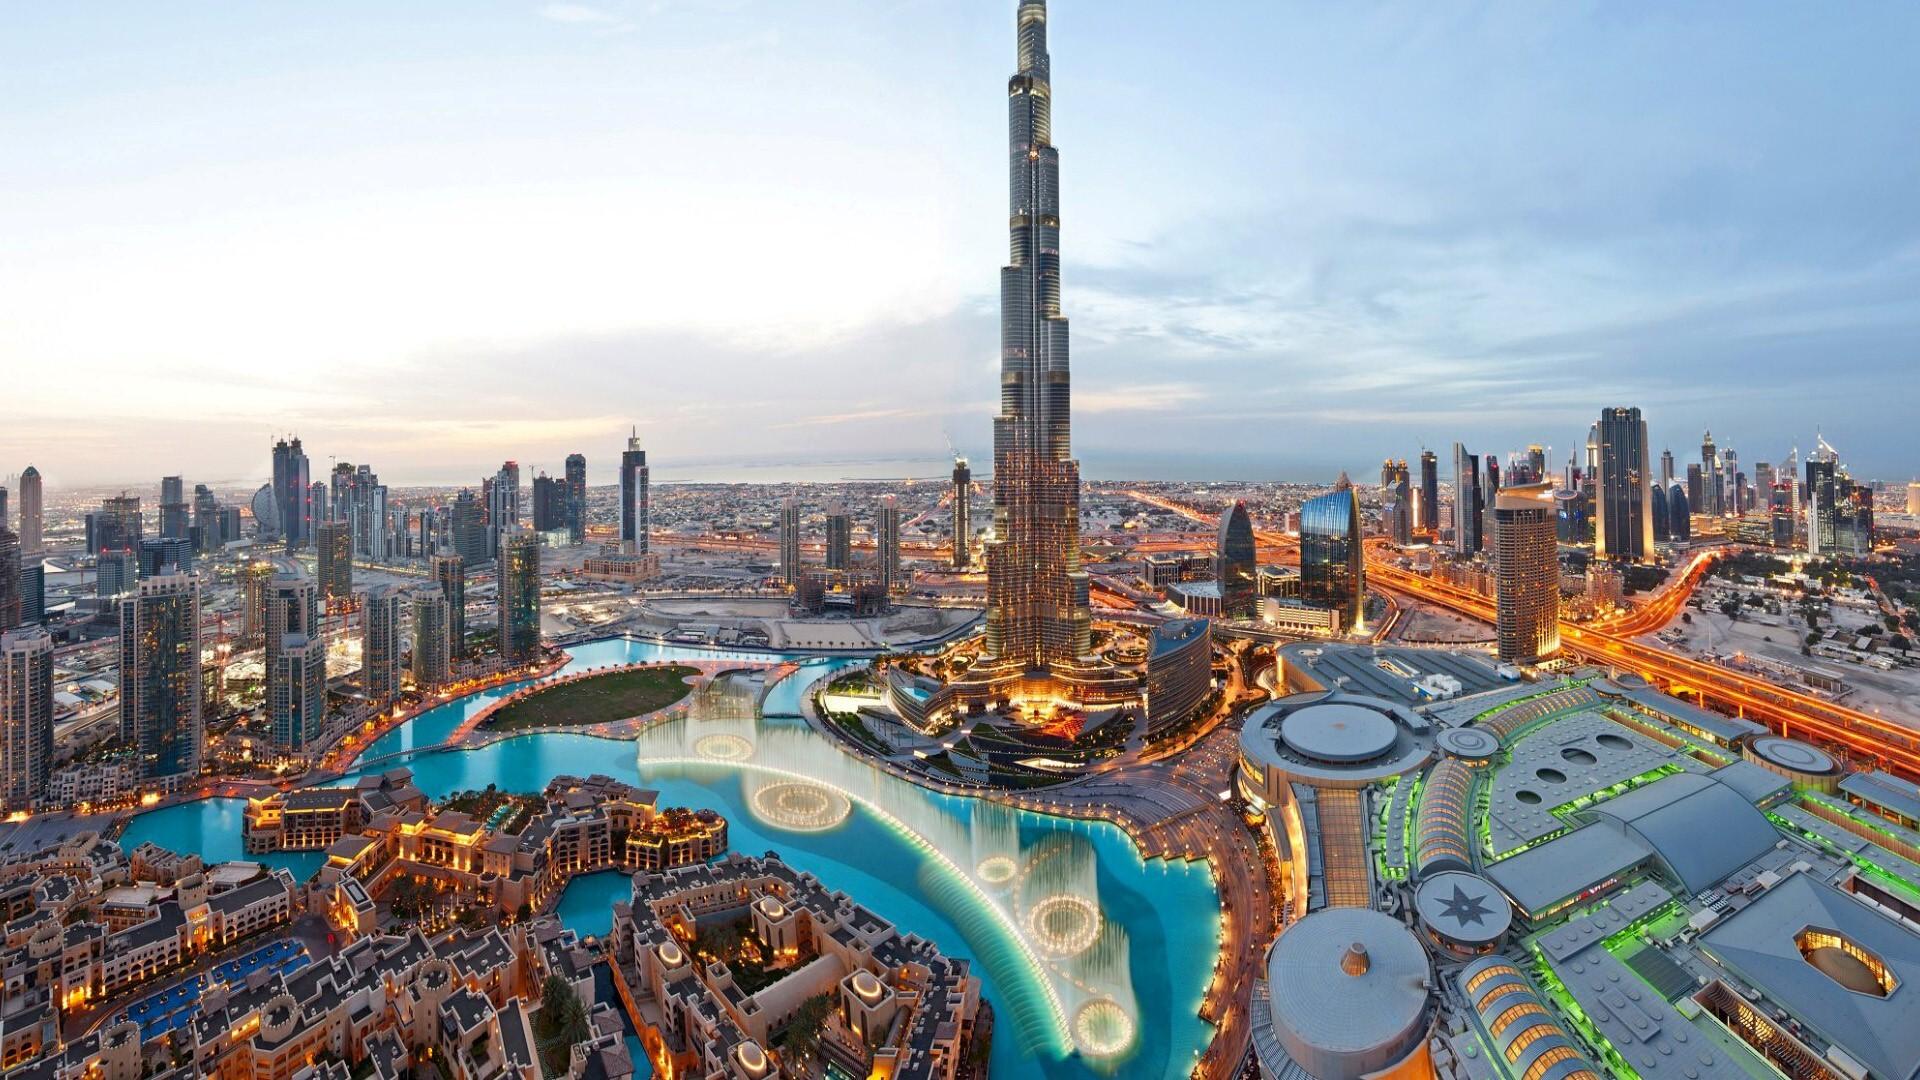 Tourist place burj khalifa in dubai hd wallpapers - Dubai burj khalifa hd photos ...